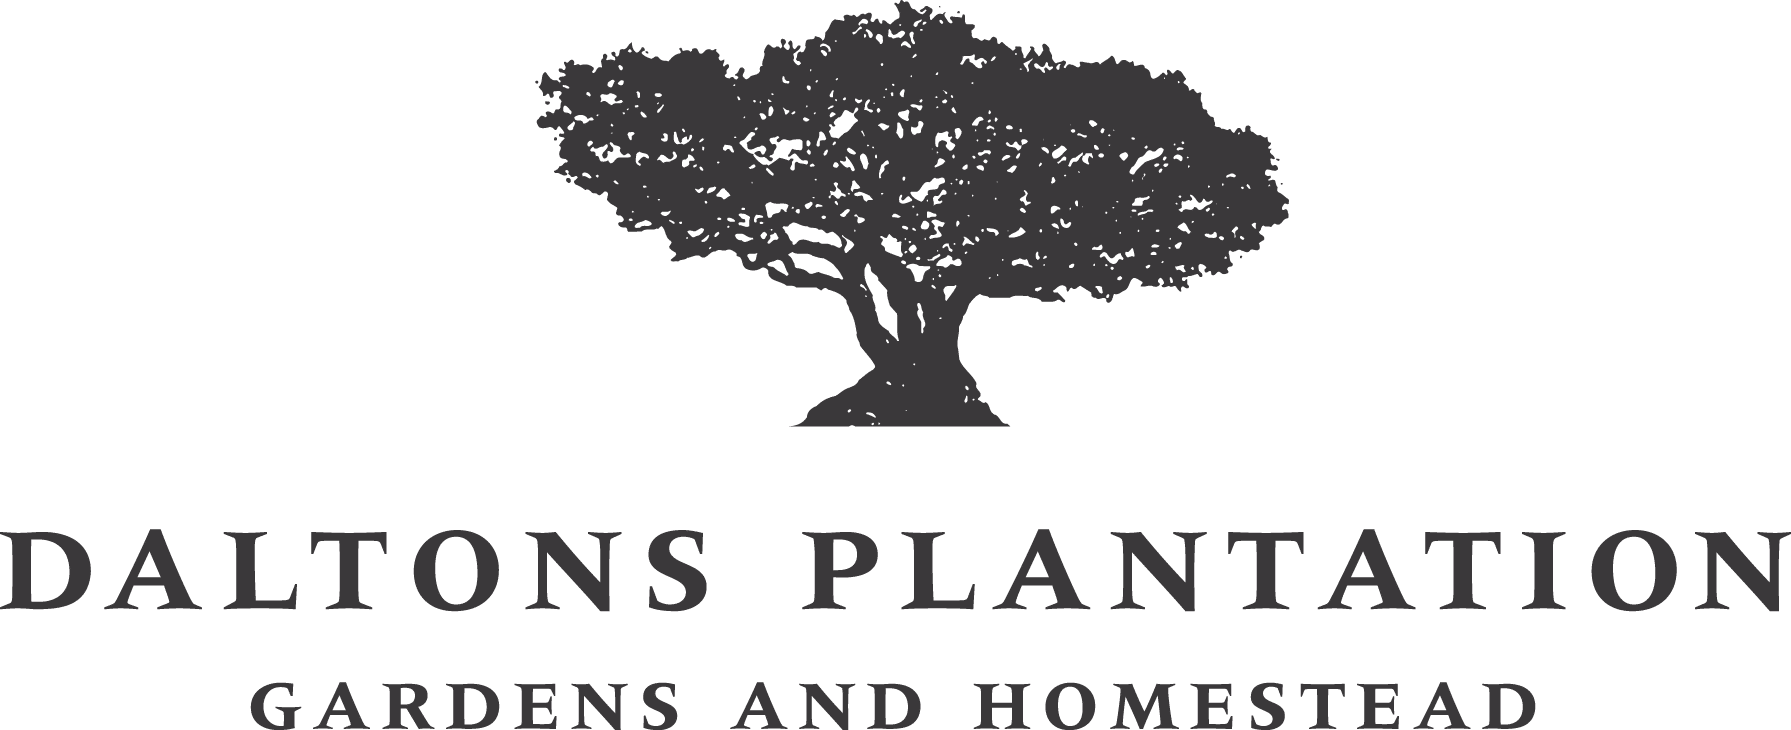 Daltons Plantation